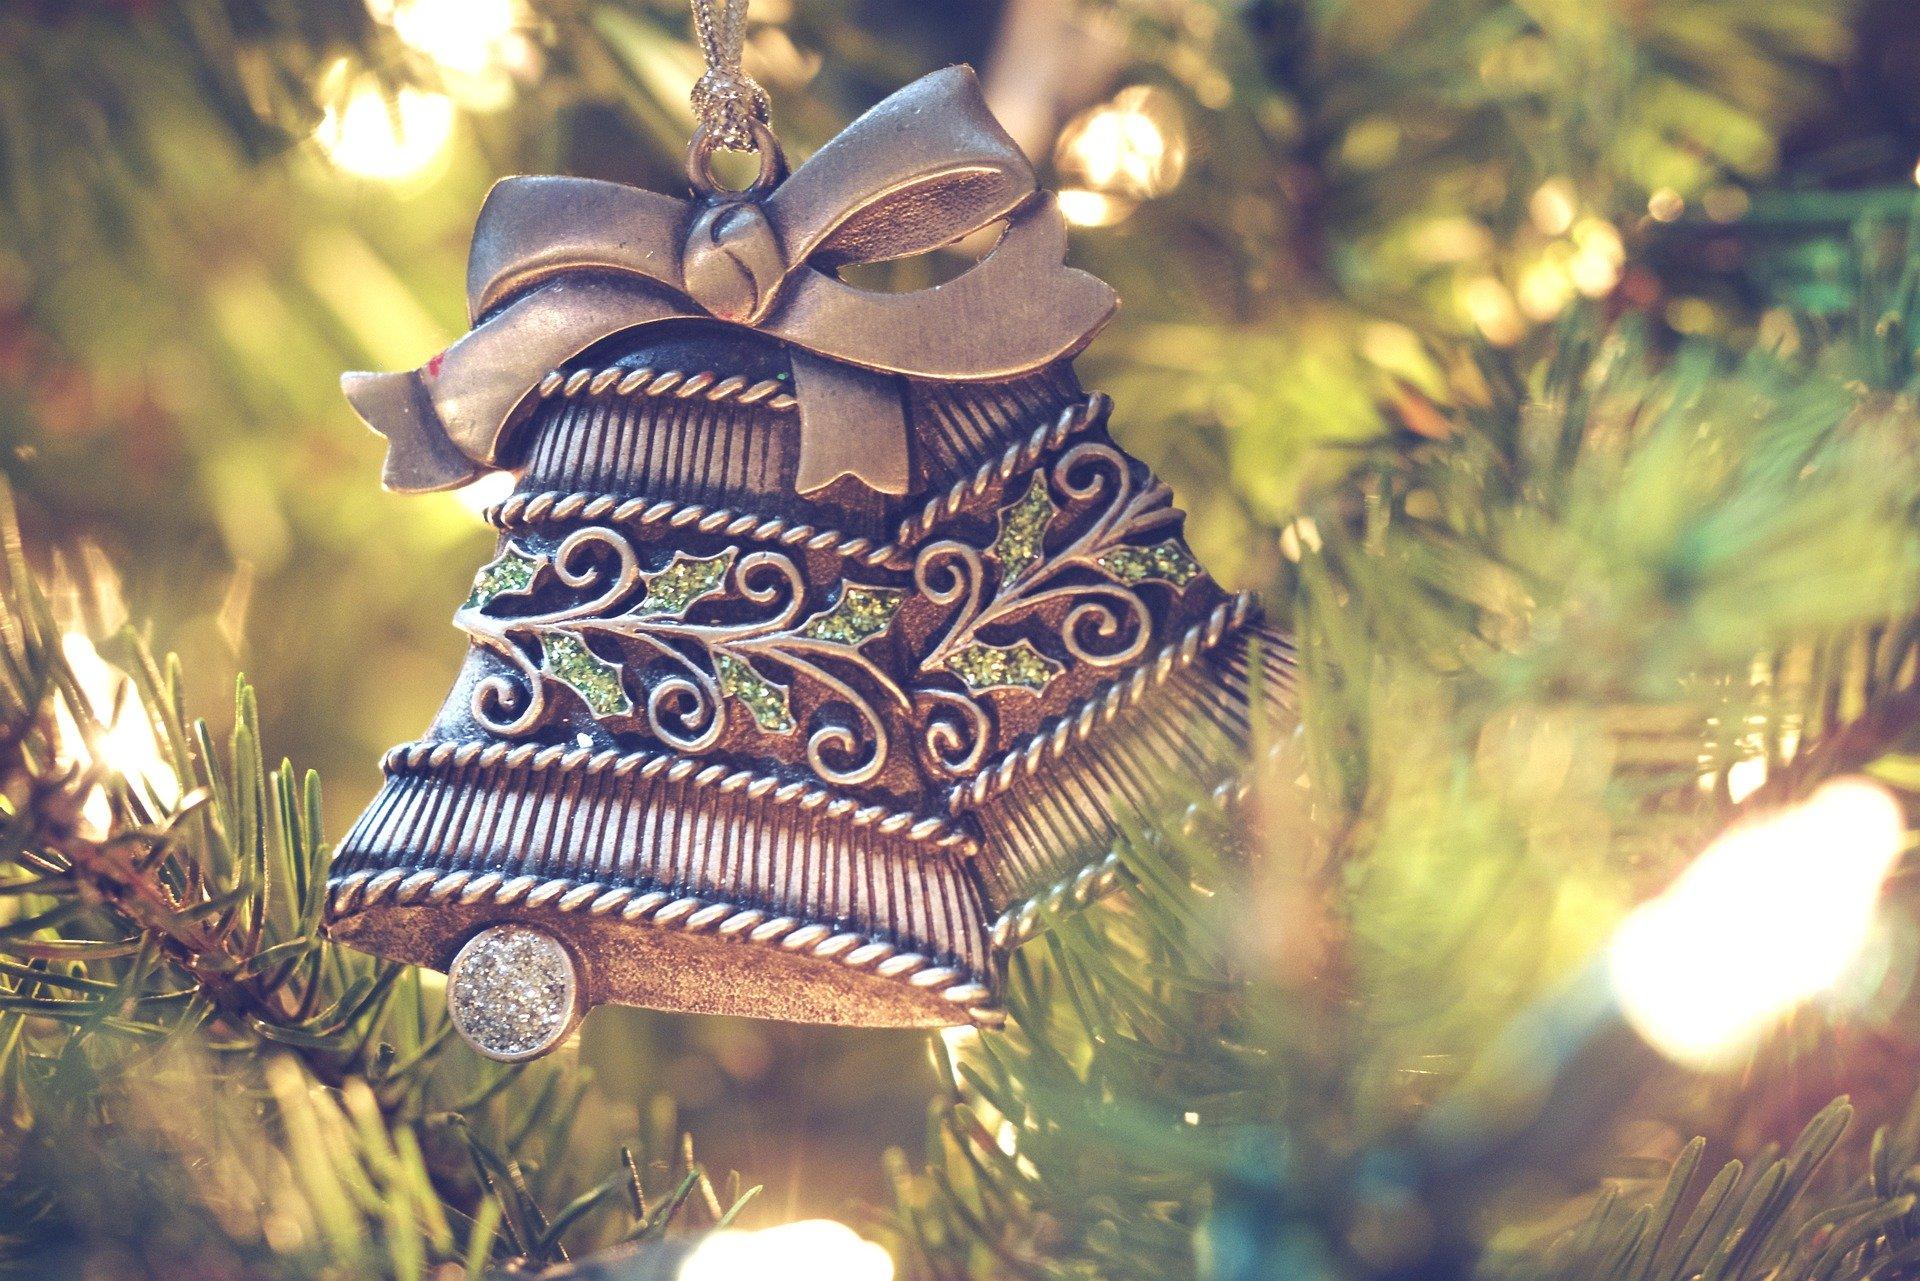 https://svbollendorf.de/wp-content/uploads/2019/12/christmas-decorations-1150015_1920.jpg